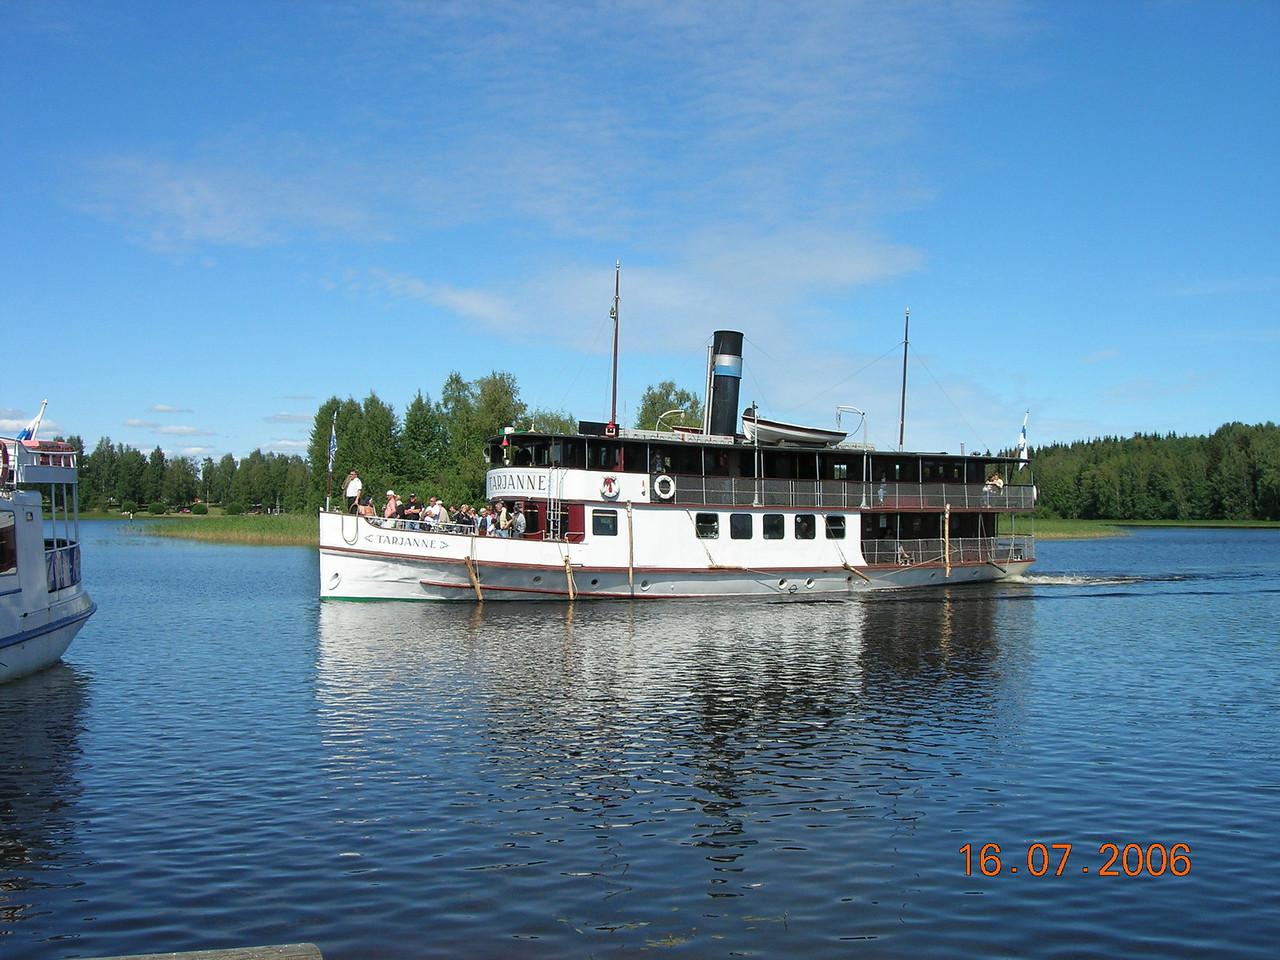 2006 - S/S TARJANNE : river route Tampere - Ruovesi - Virrat (in Finland)